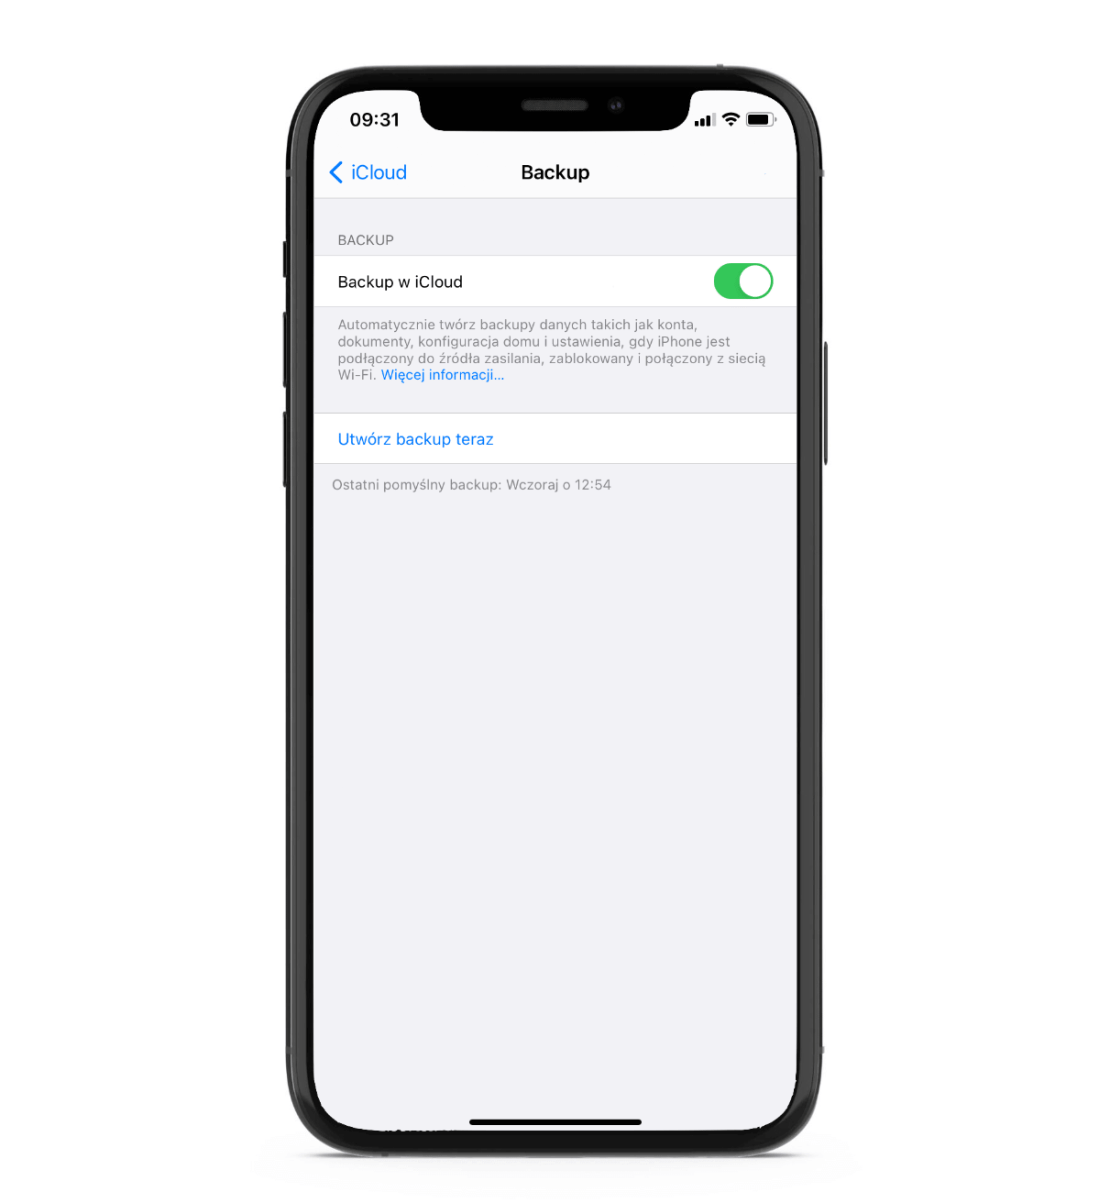 Tworzenie backupu iPhone'a w iCloud